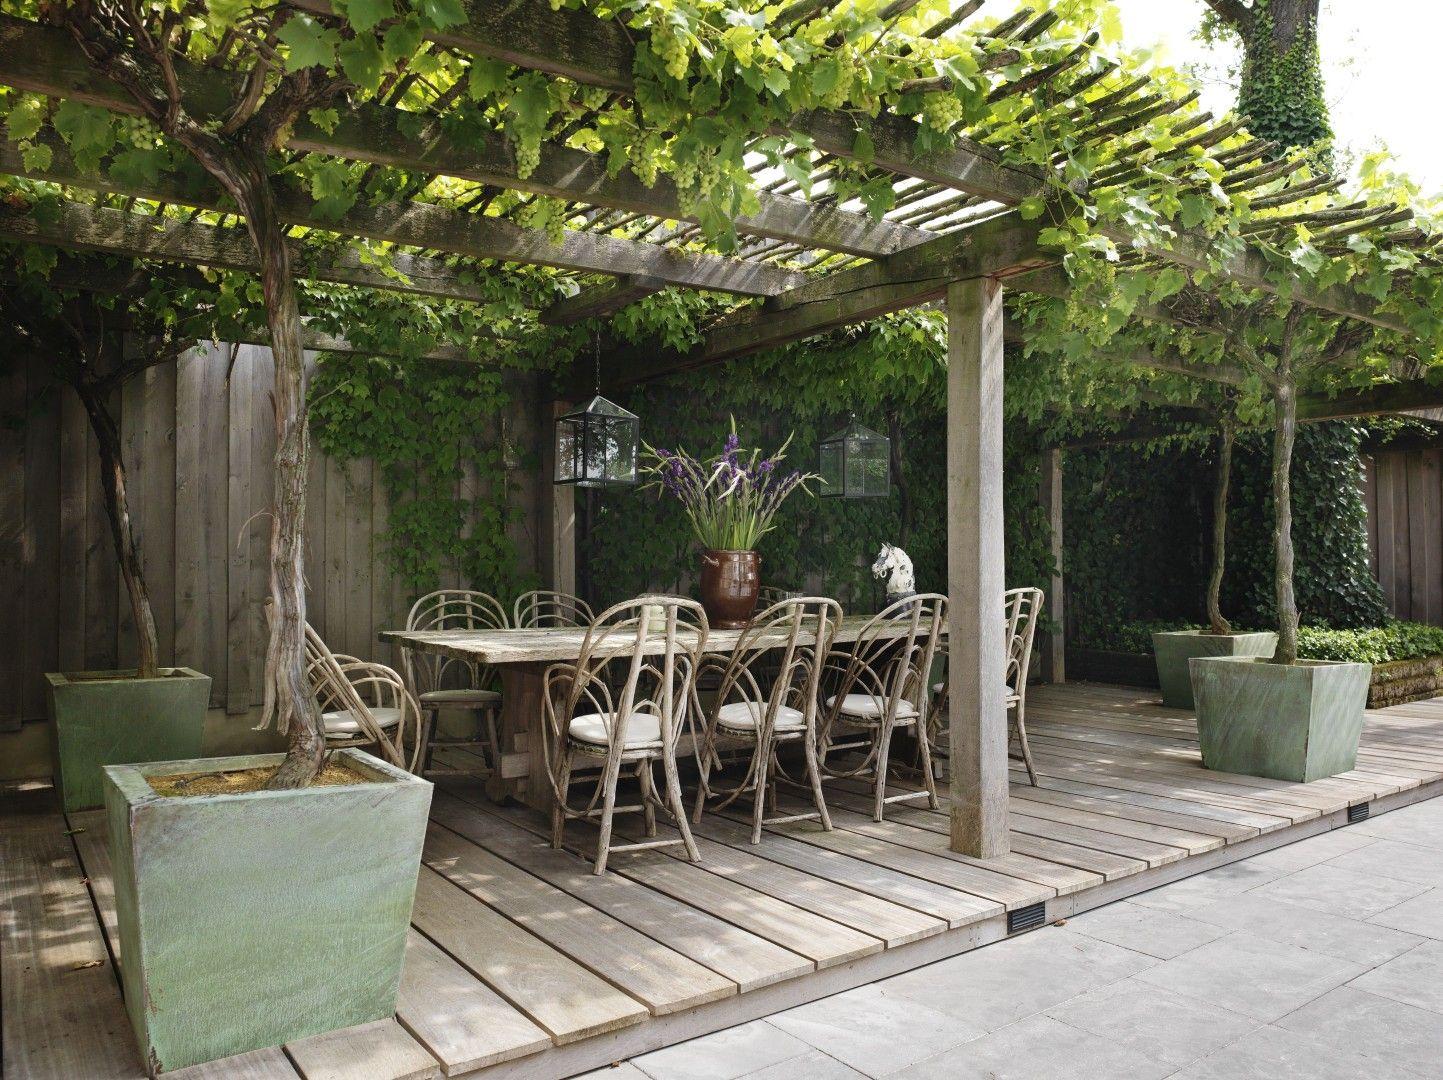 Moois en liefs tuin inspiratie contemporary garden inspiration pinterest gardens - Tuin idee ...